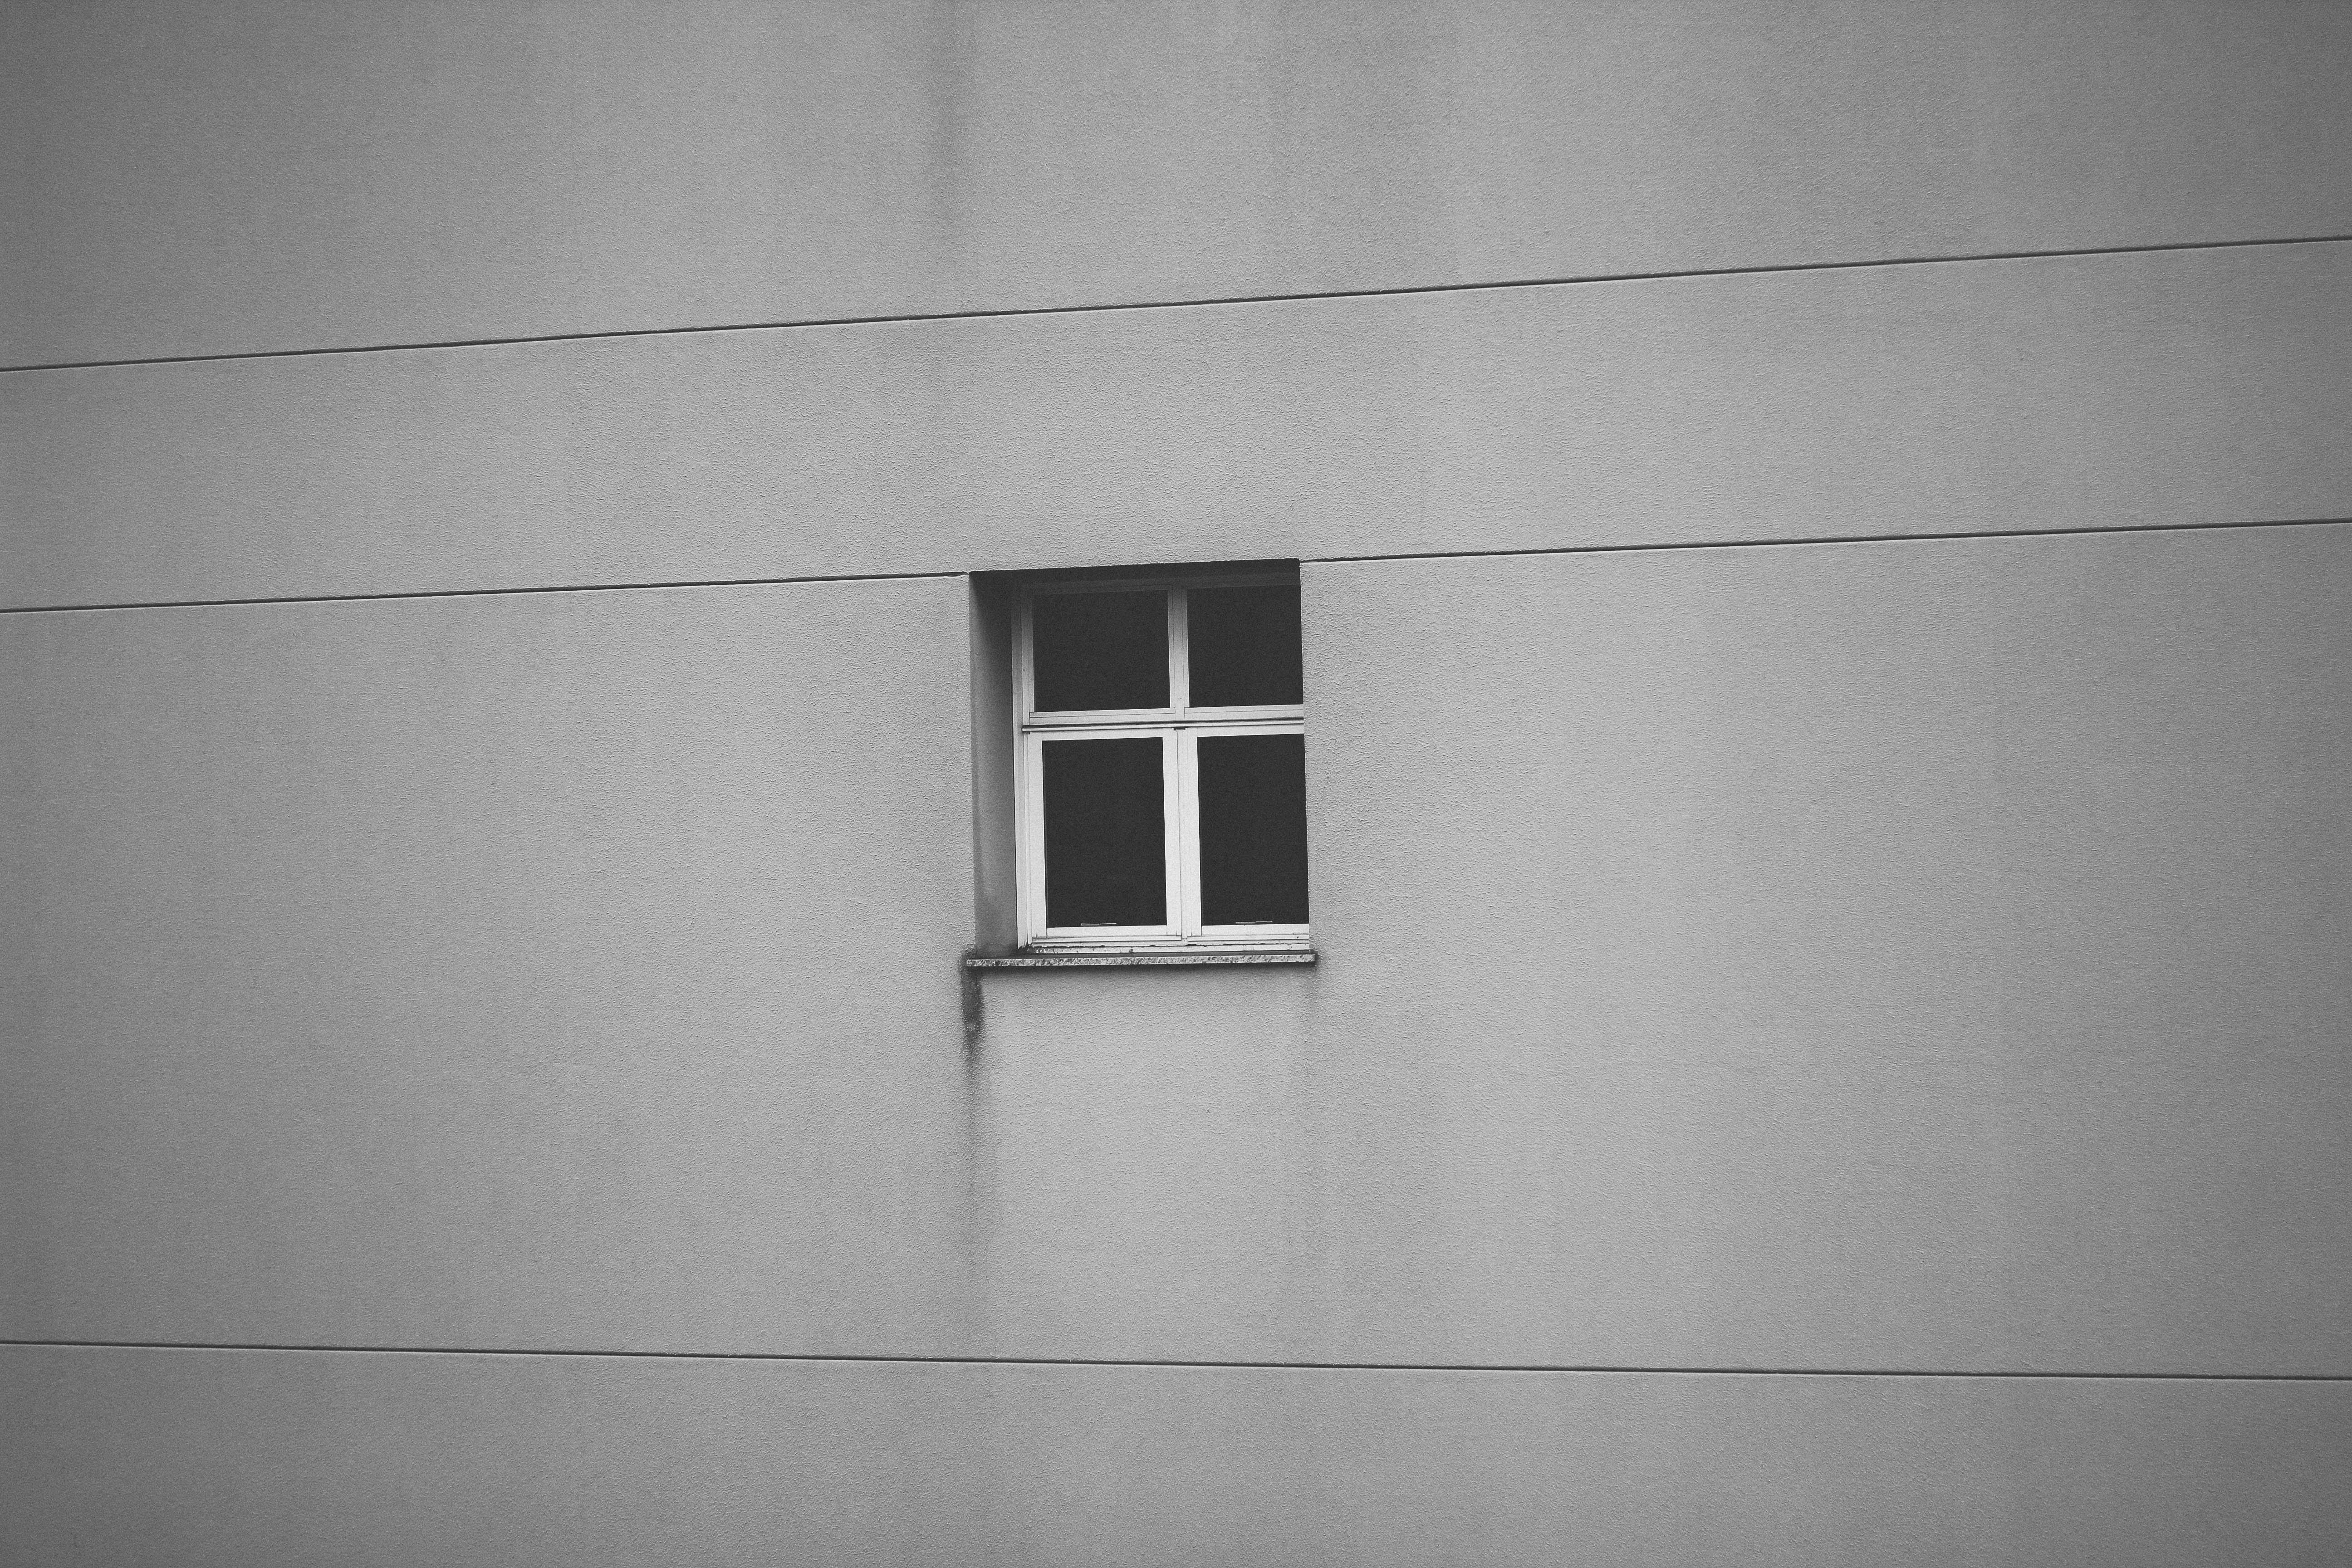 black window with frame